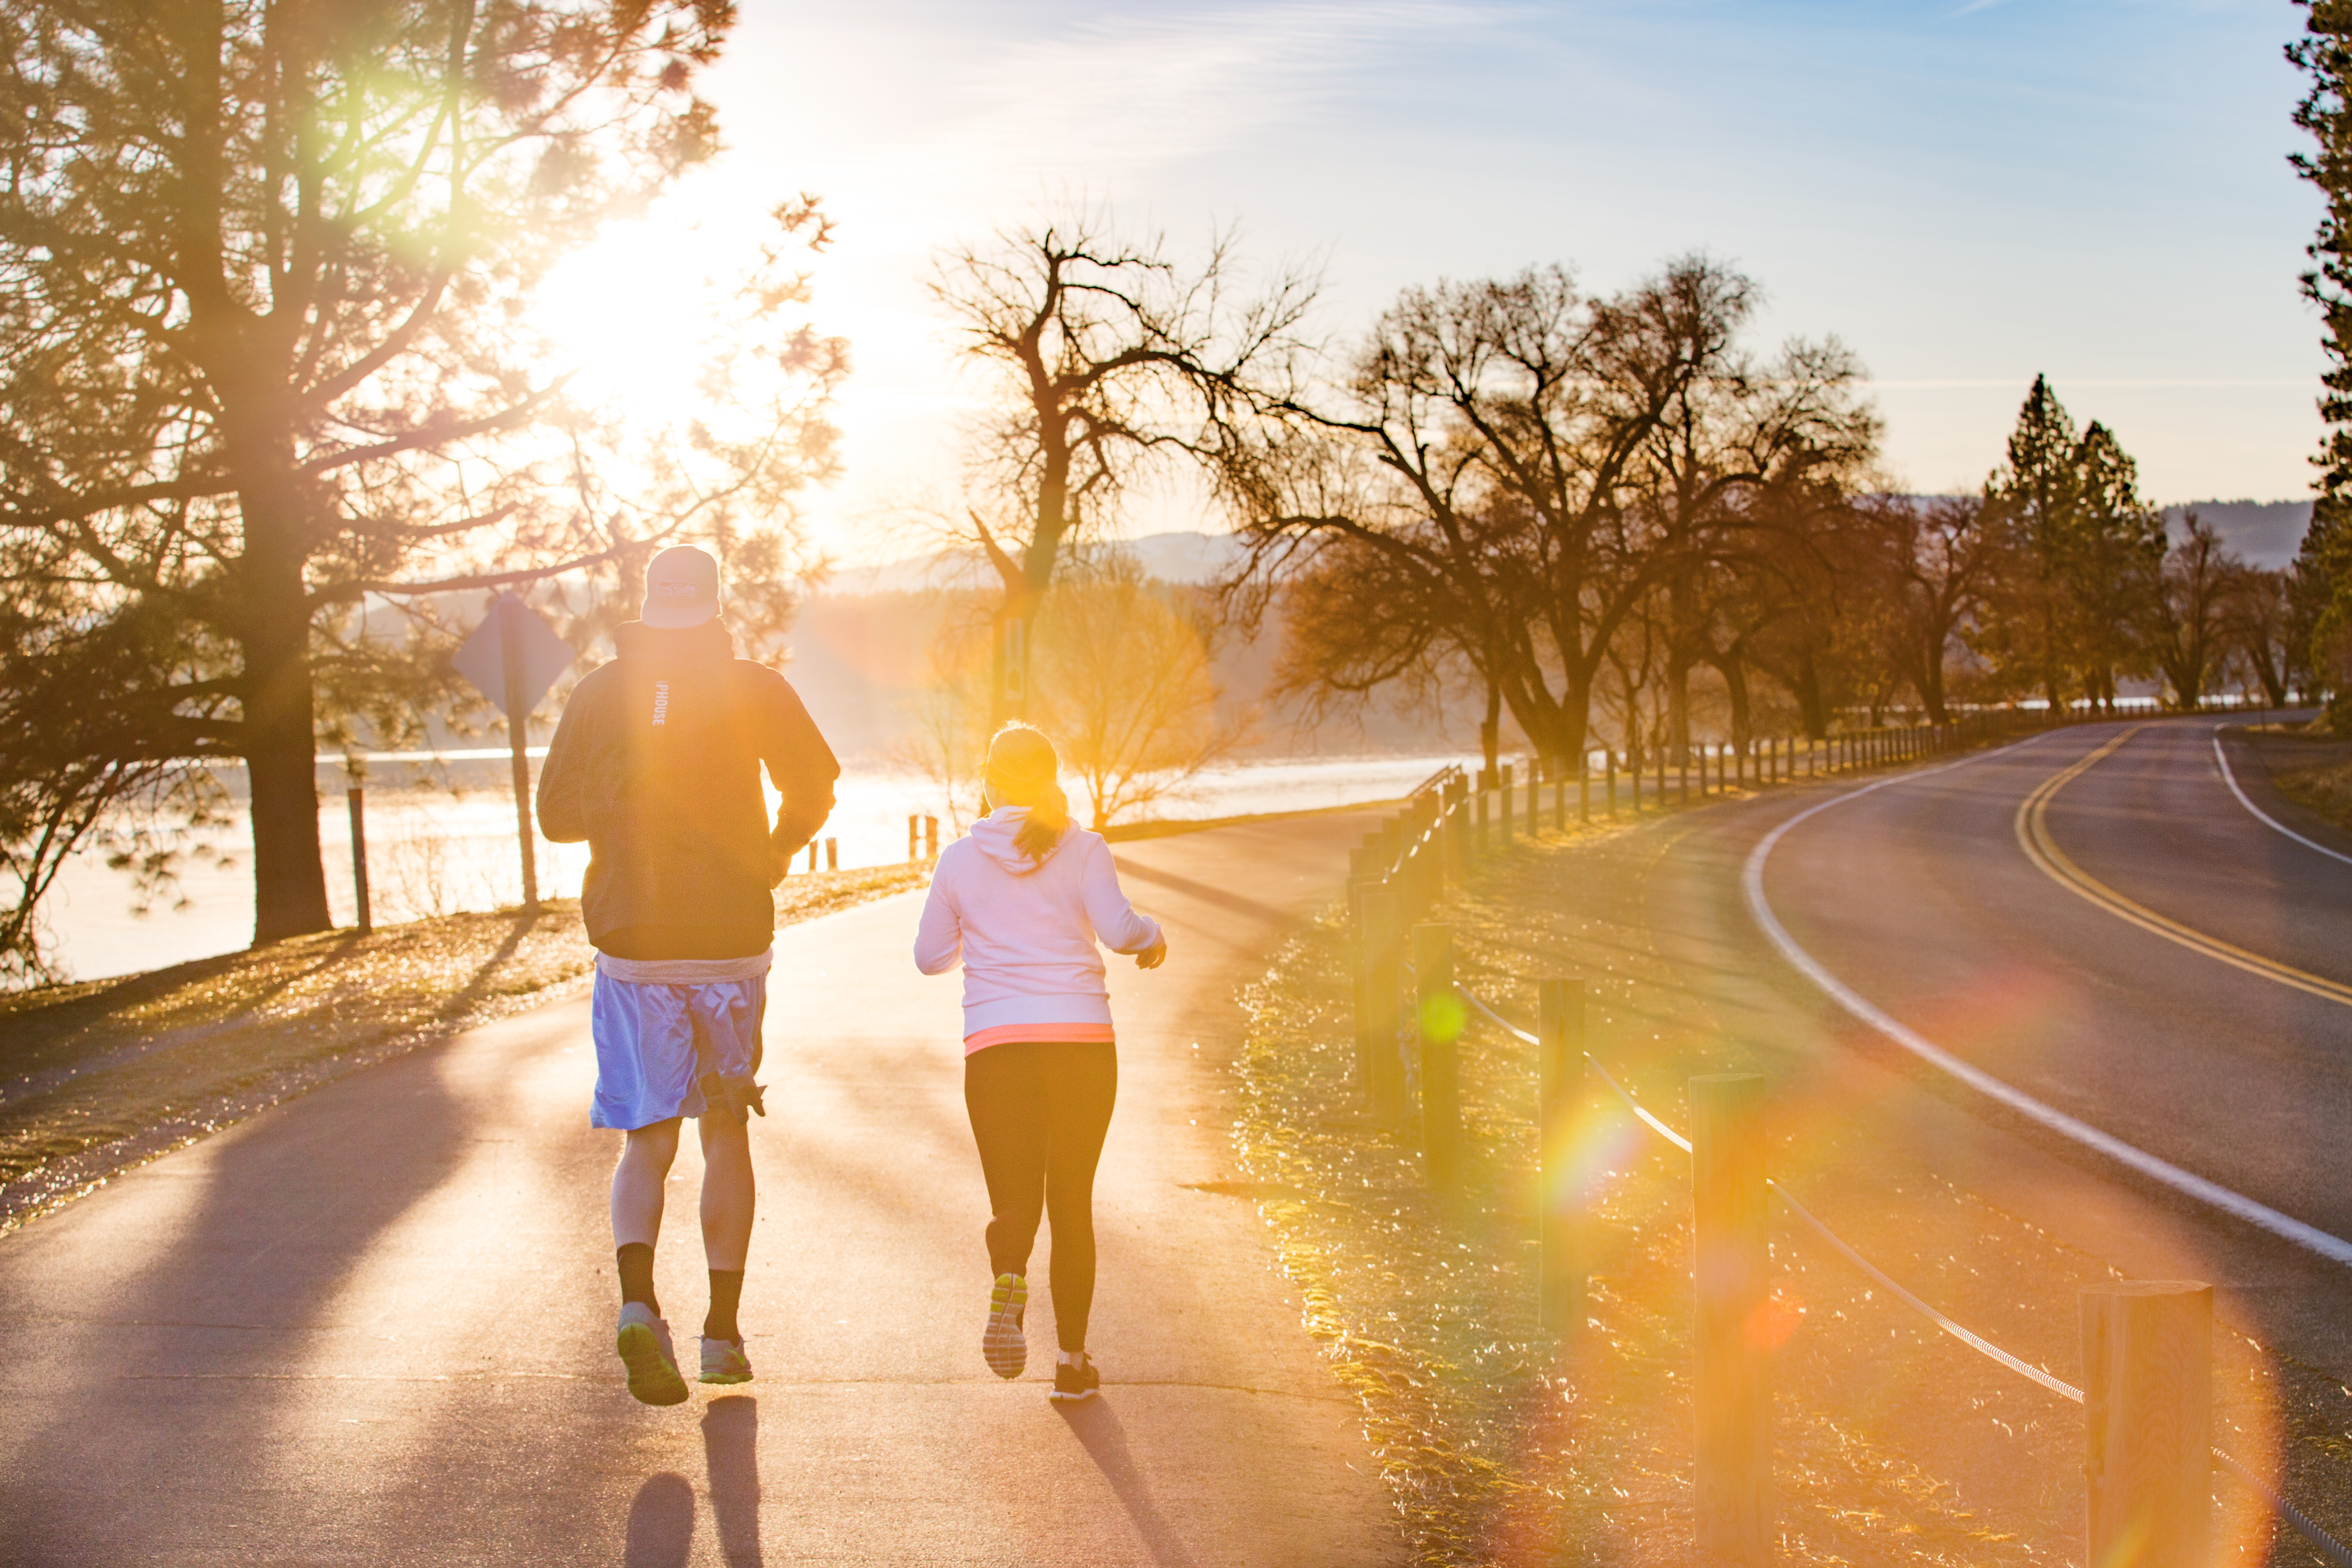 Enjoying an afternoon jog along the Lake CDA running path. Photo Credit: Idaho Tourism